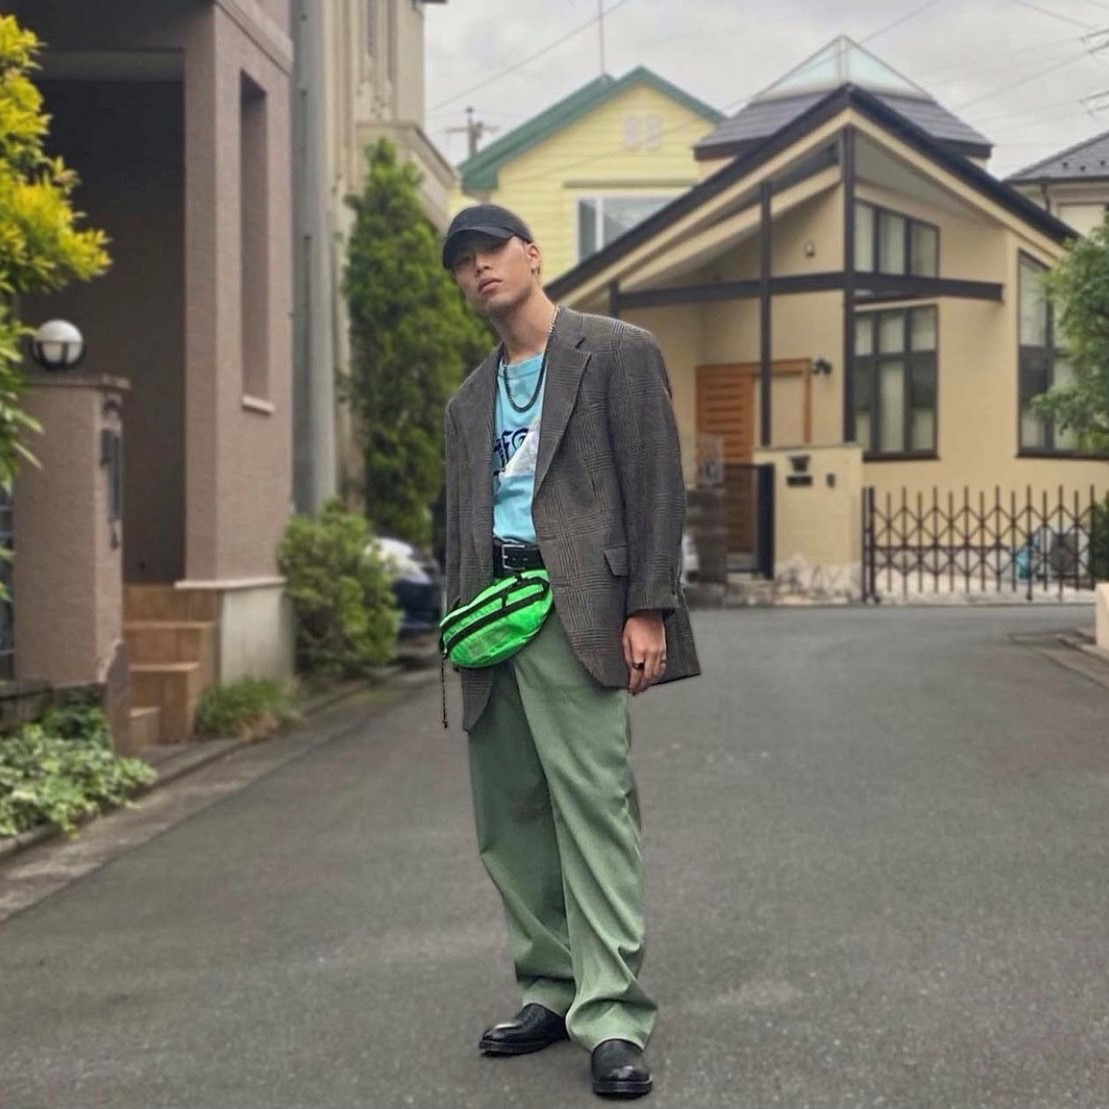 Katsuya Murakamiのプロフィール写真